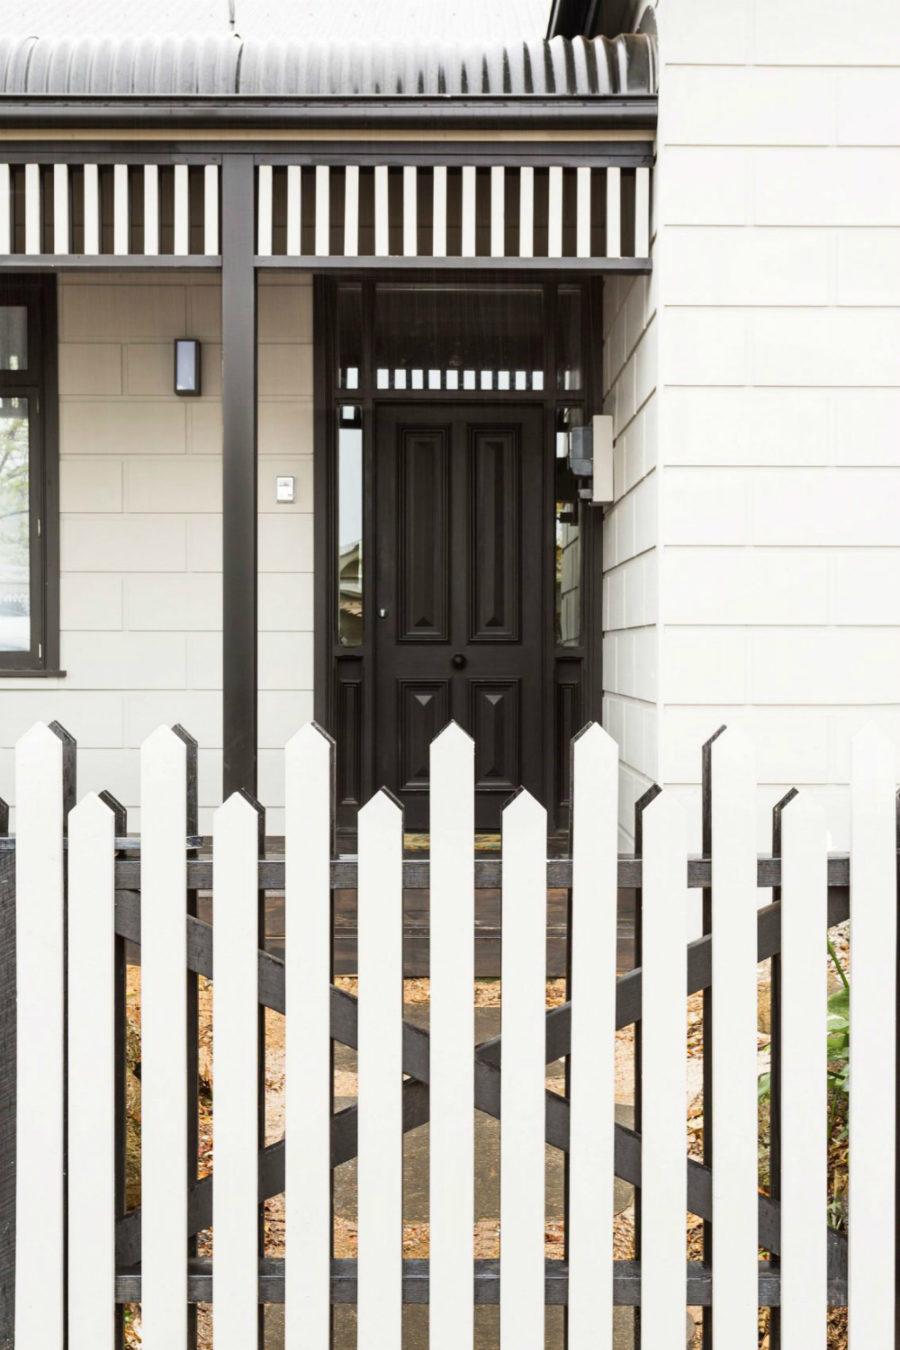 Asymmetric fence